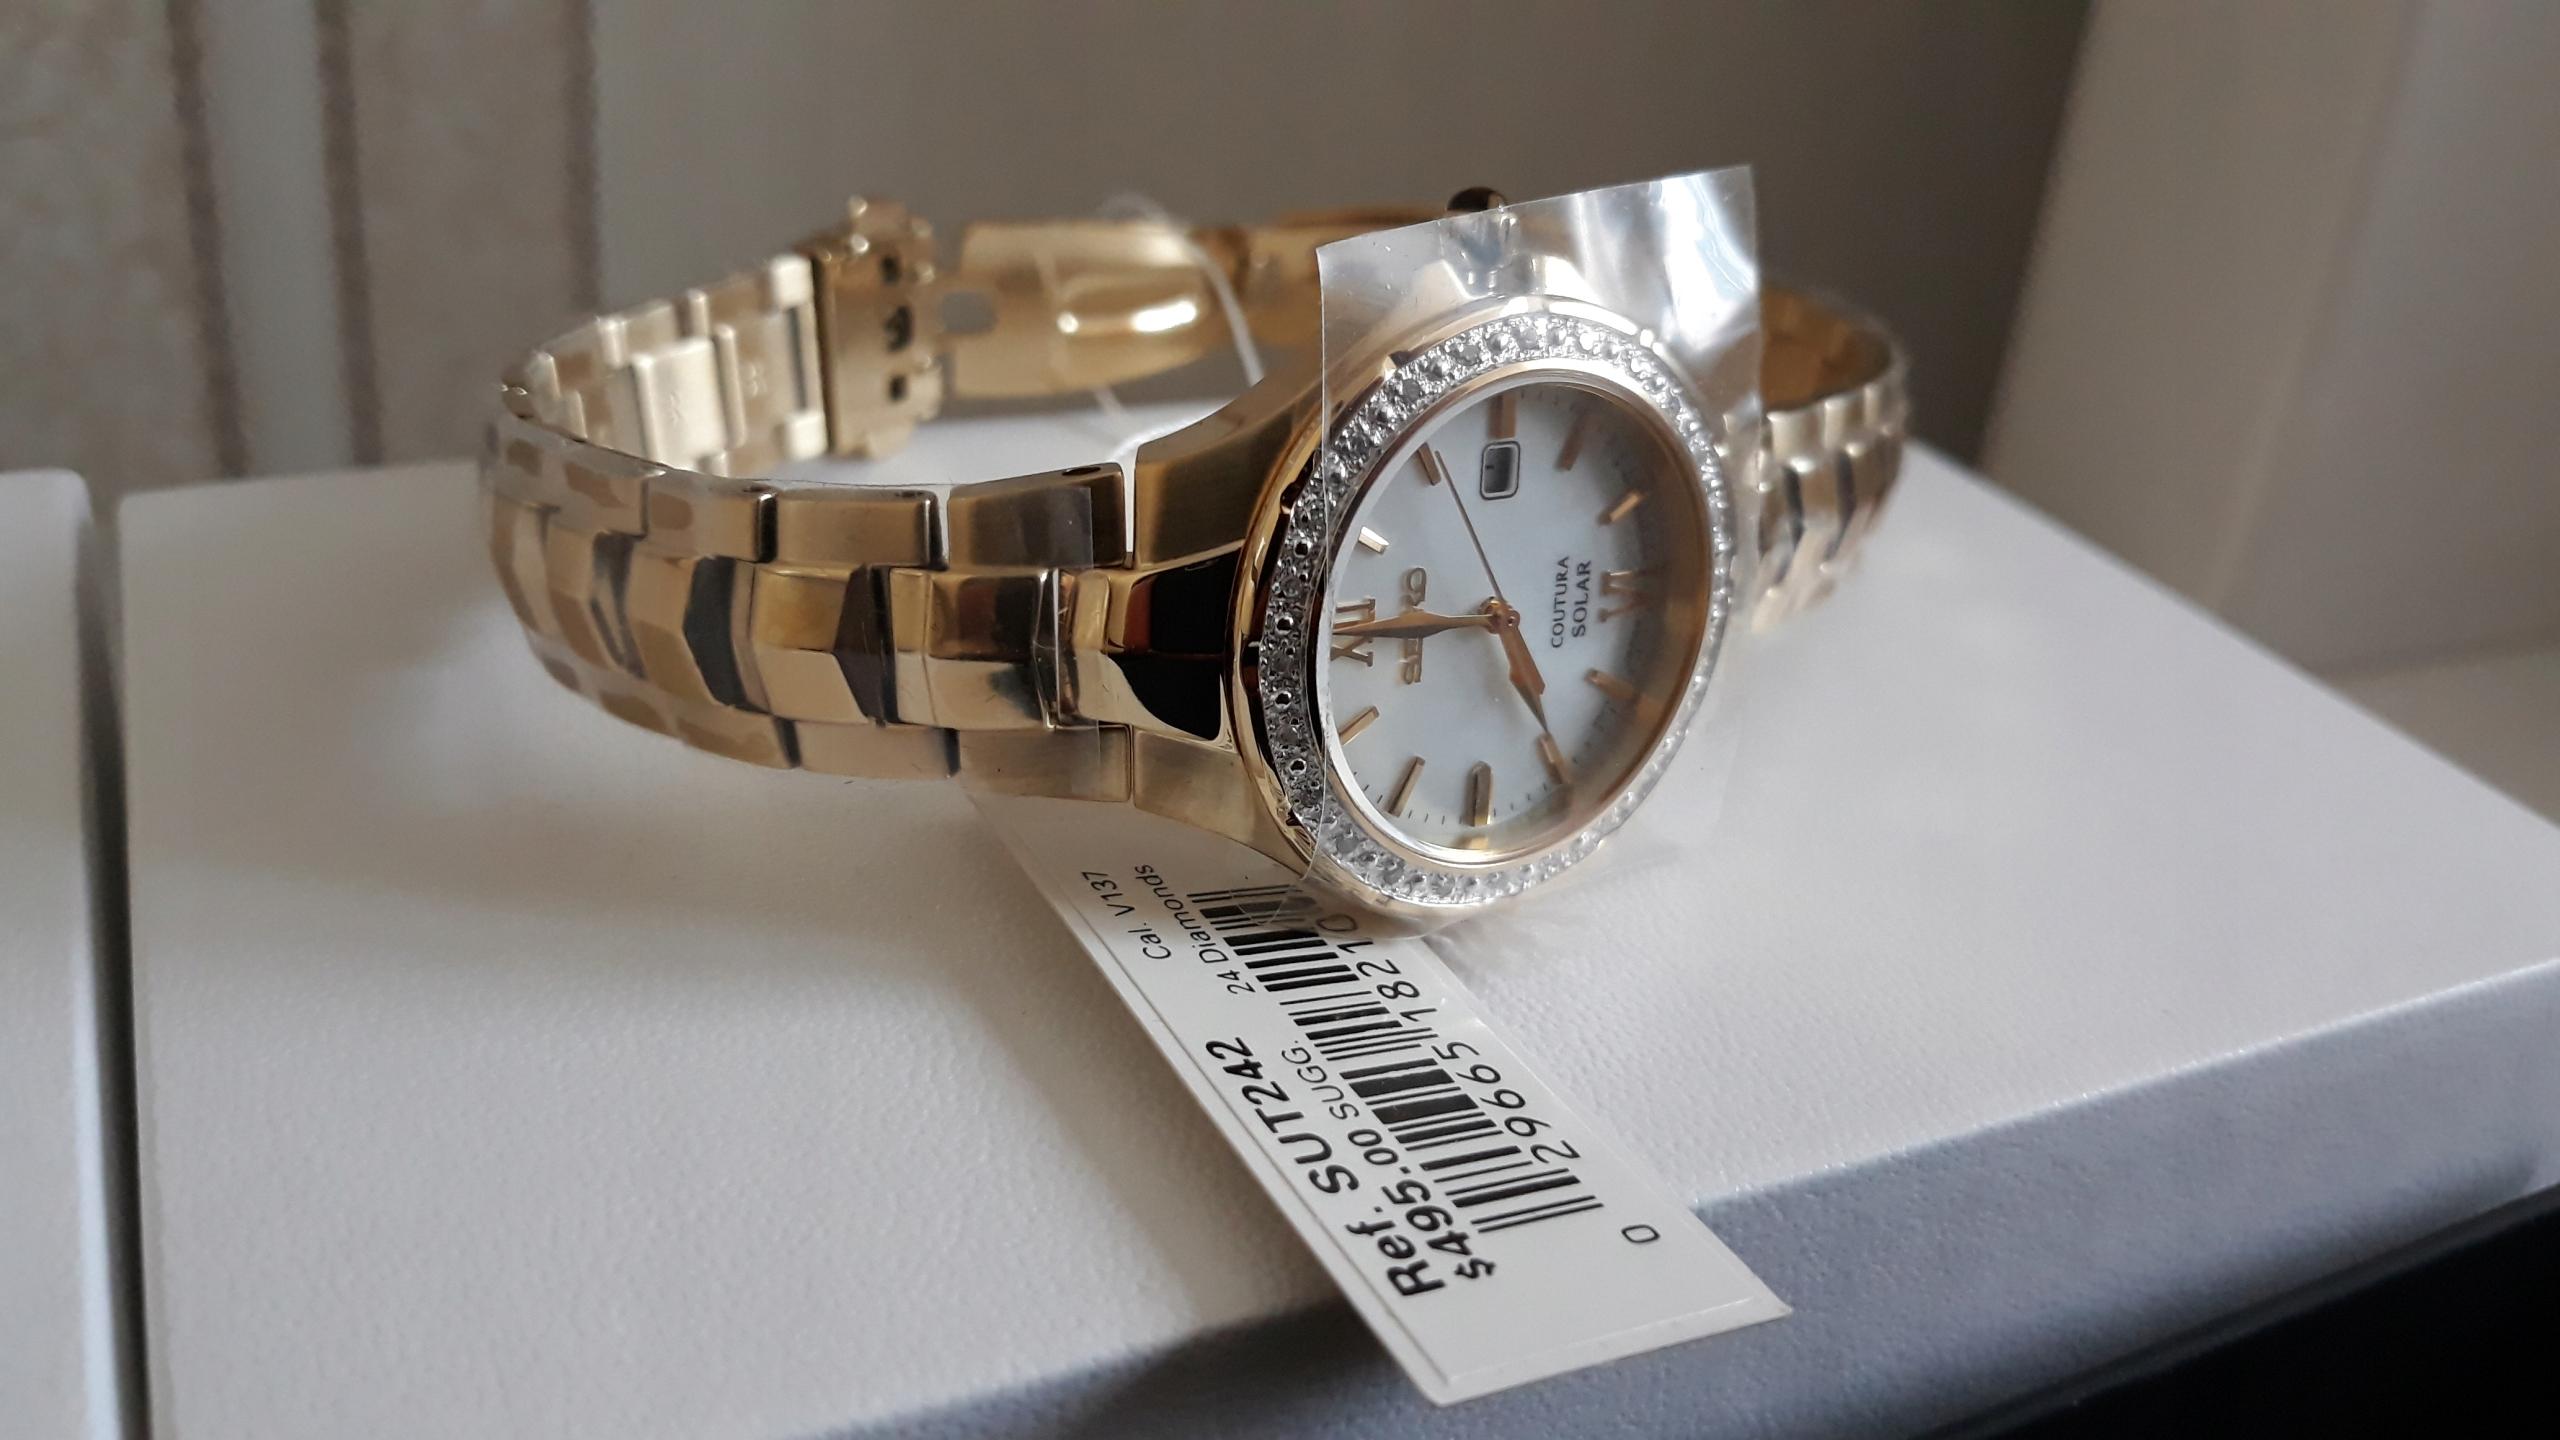 SEIKO SUT242 zegarek damski solar perła 2499zł